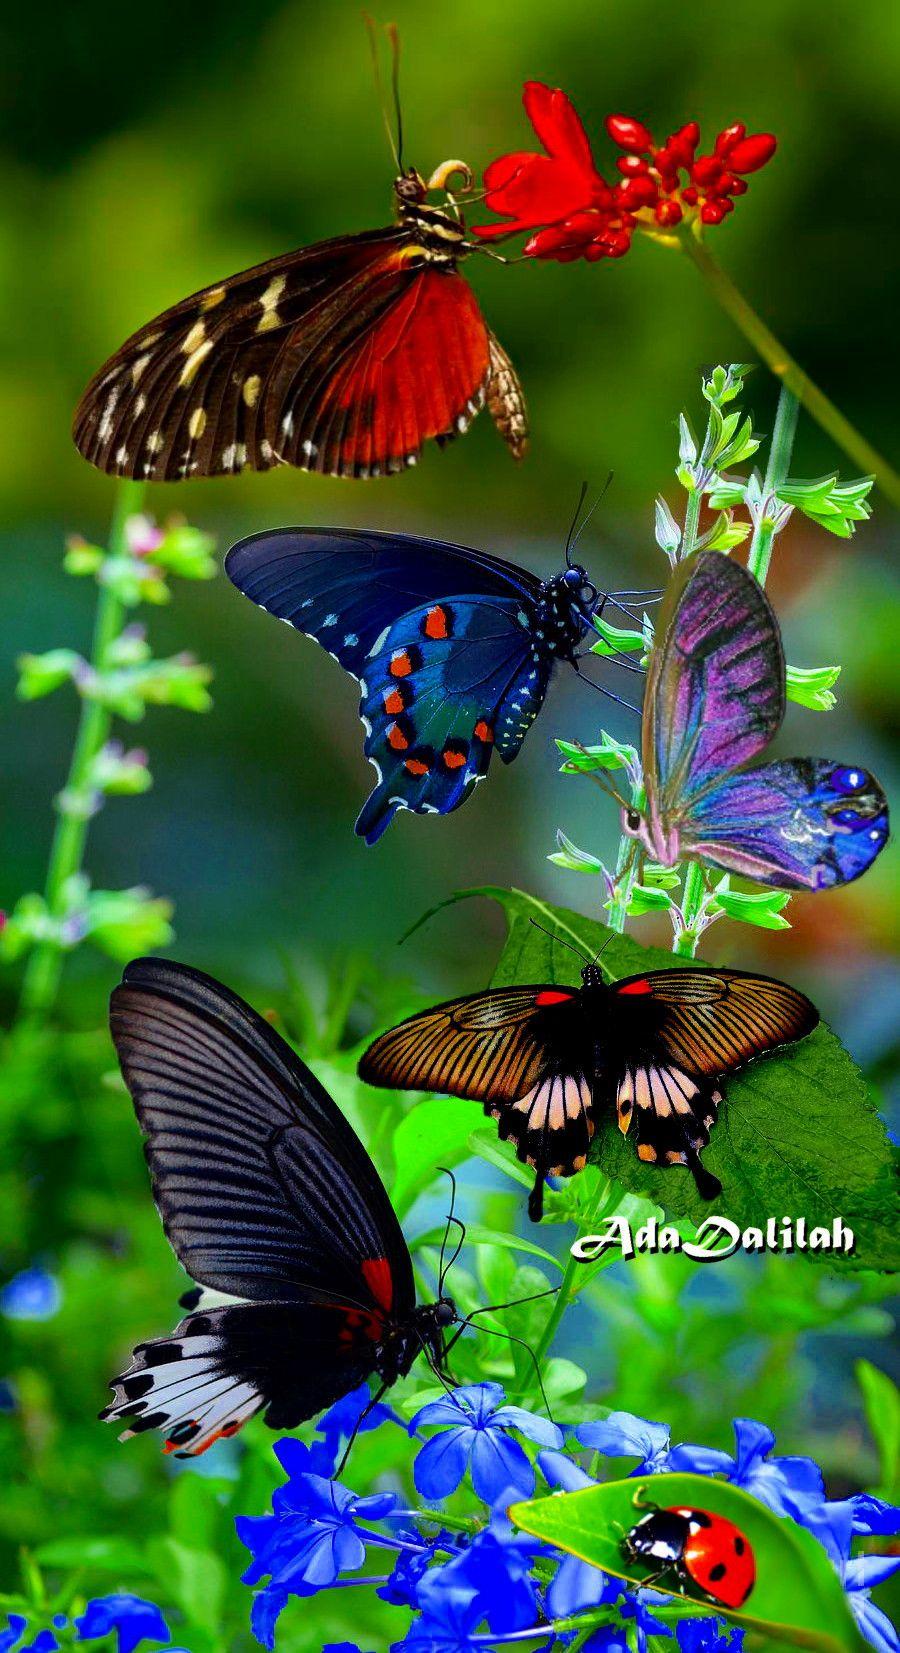 Pin De Ada Dalilah Em Flowers Butterflies Art Creation Em 2020 Fotos De Borboletas Coloridas Passaros Coloridos Fotos De Borboletas